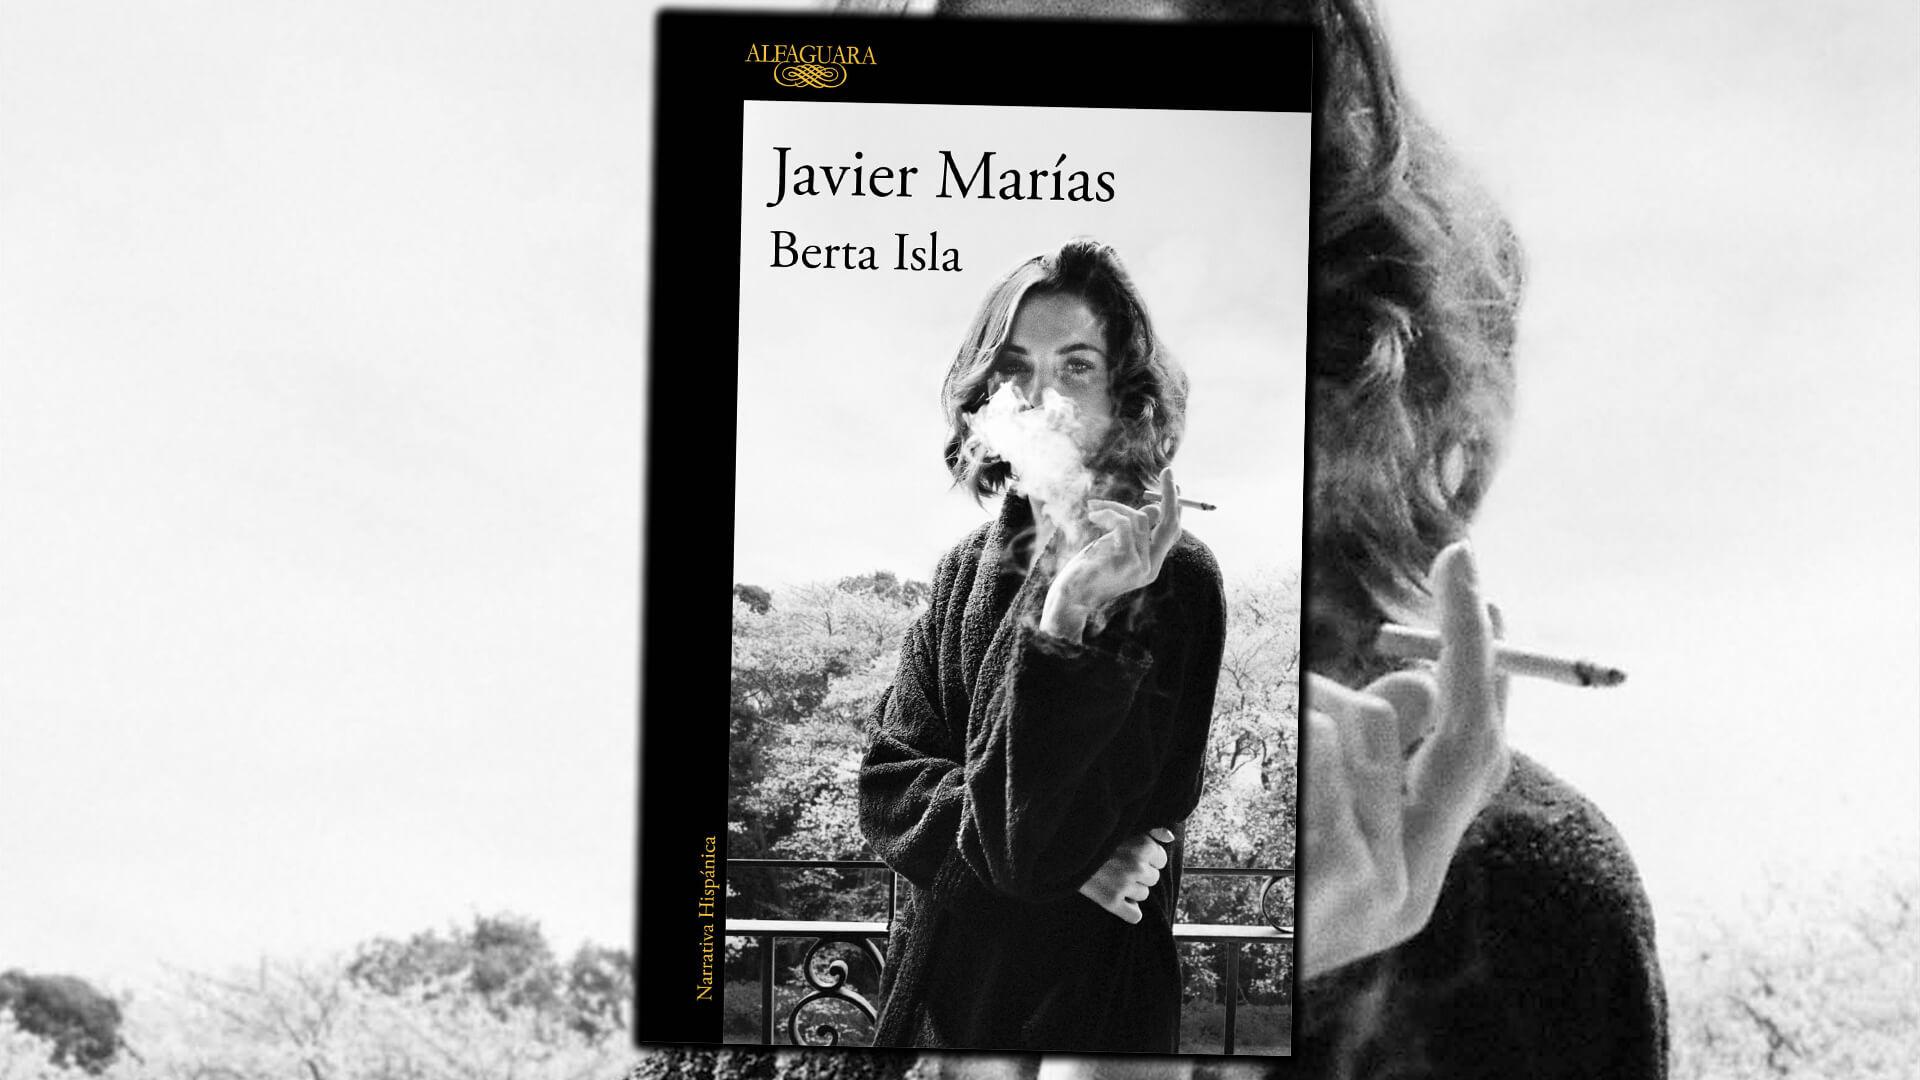 berta-isla-javier-marias-portada-web.jpg